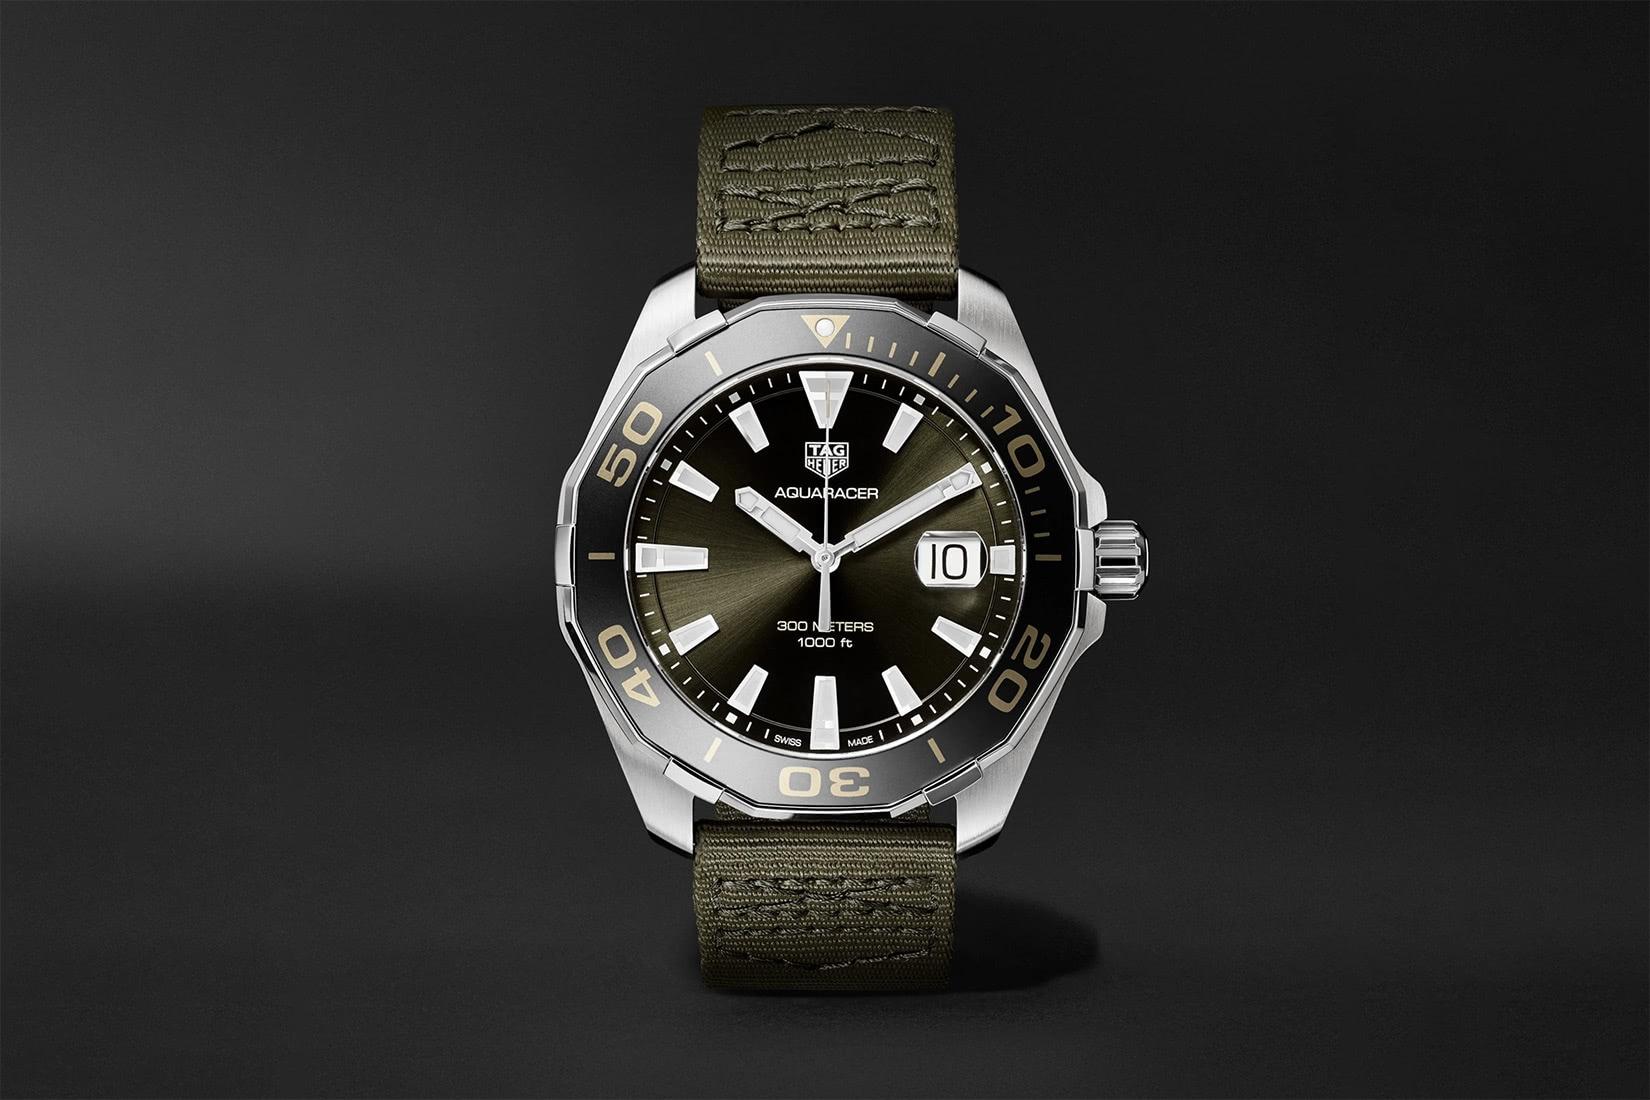 mejor reloj de buceo tag heuer aquaracer - Luxe Digital